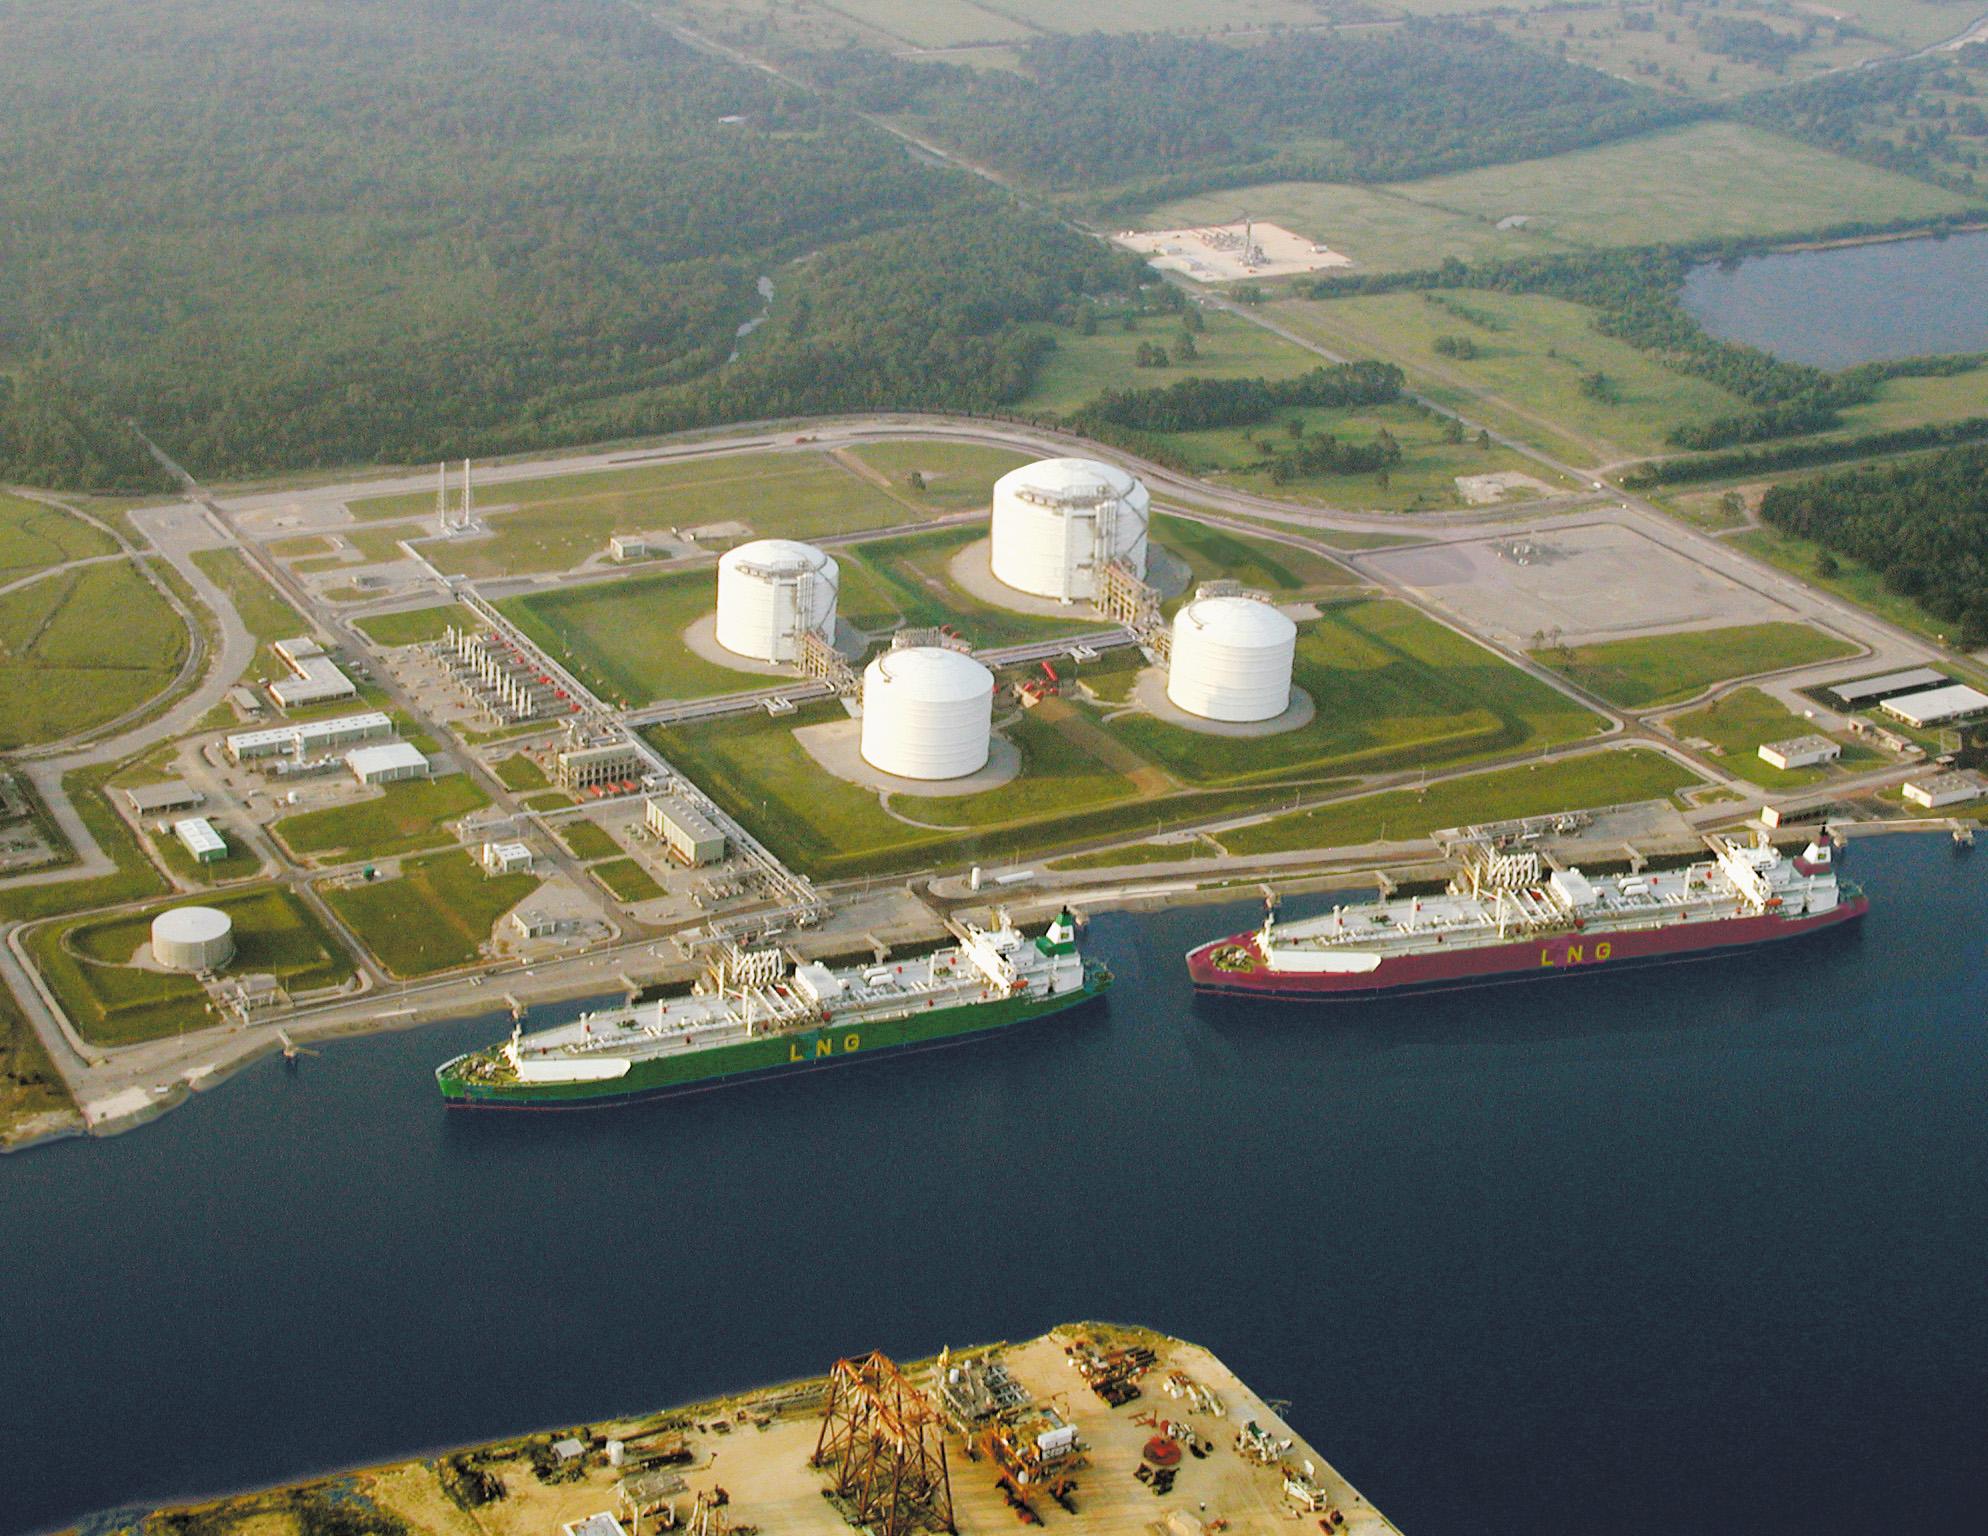 BG_Trunkline_Lake-Charles_LNG_project